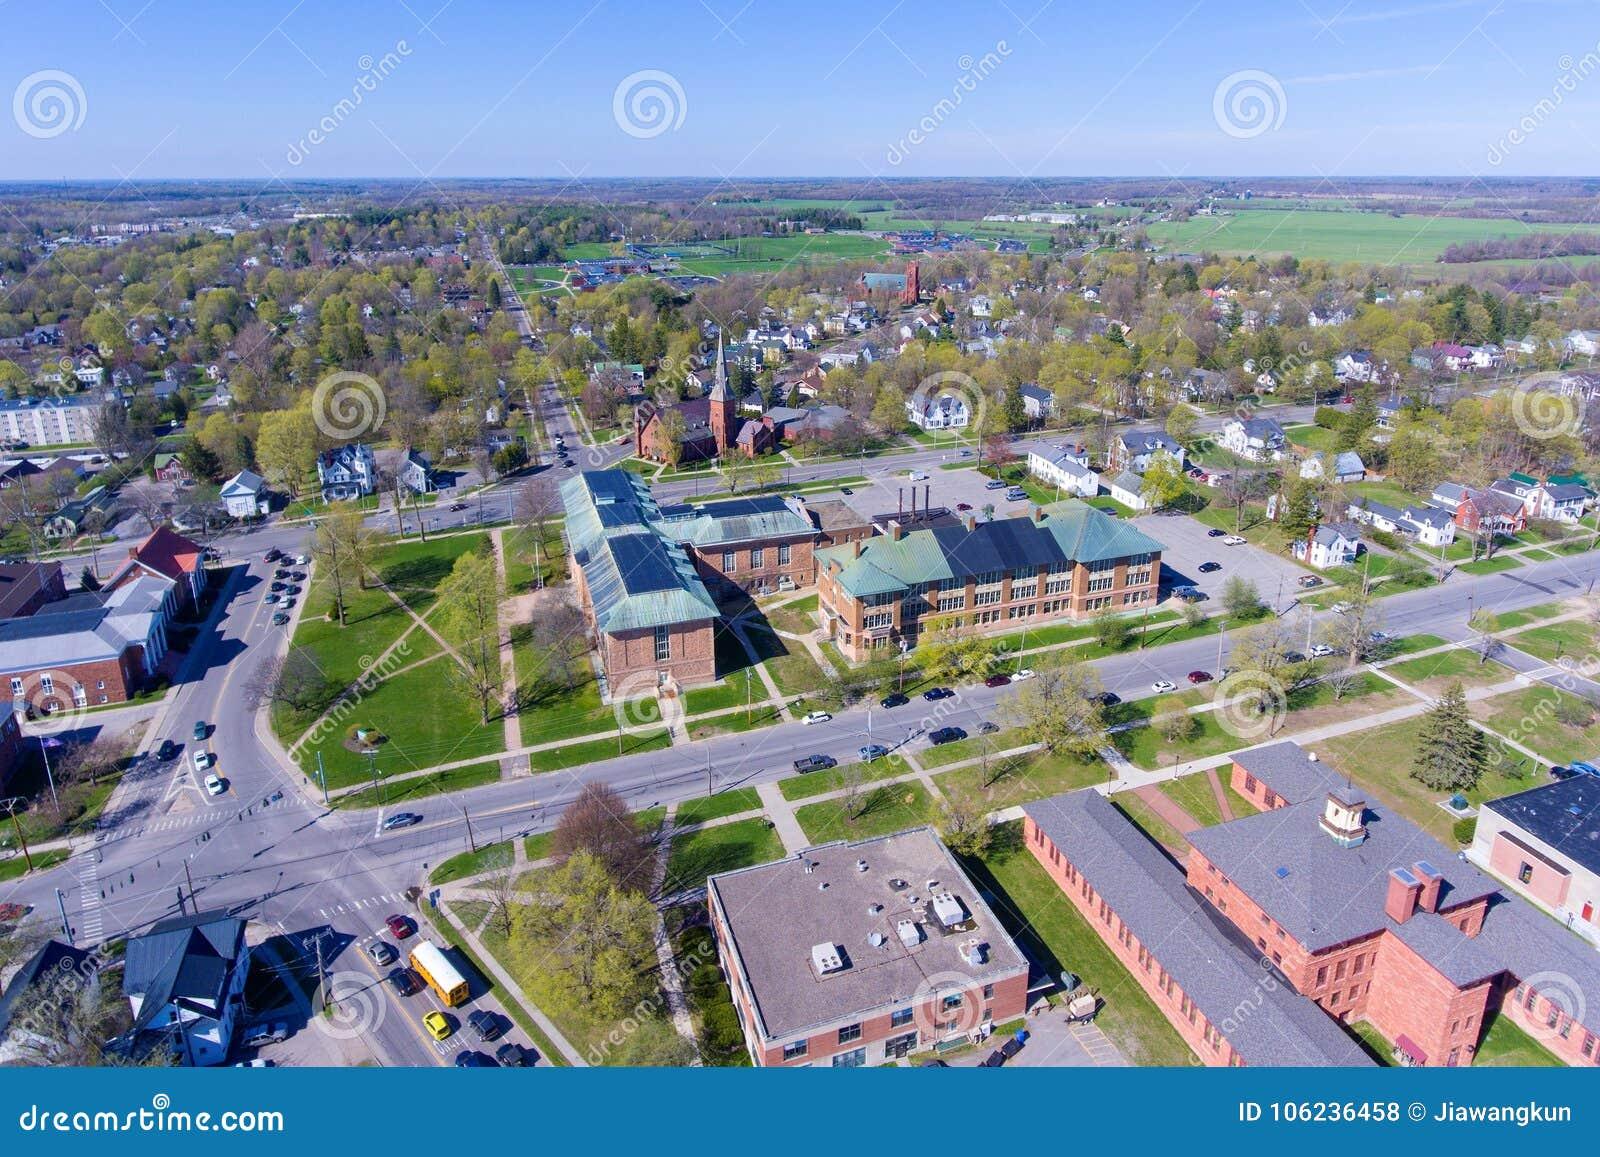 Vista aérea de la universidad de Clarkson, Potsdam, NY, los E.E.U.U.